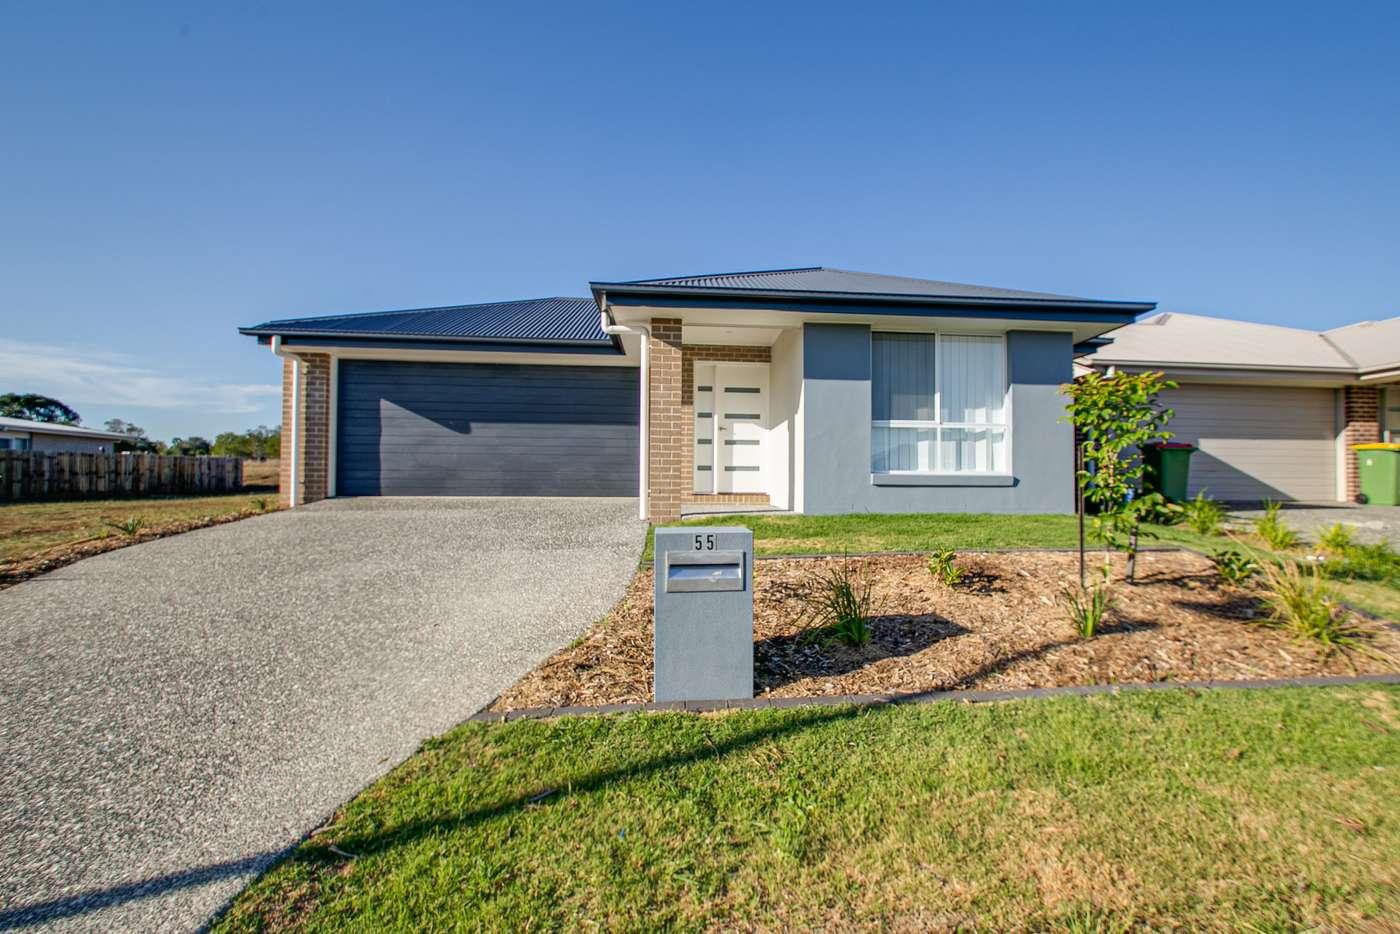 Main view of Homely house listing, 55 Mackellar Way, Walloon QLD 4306